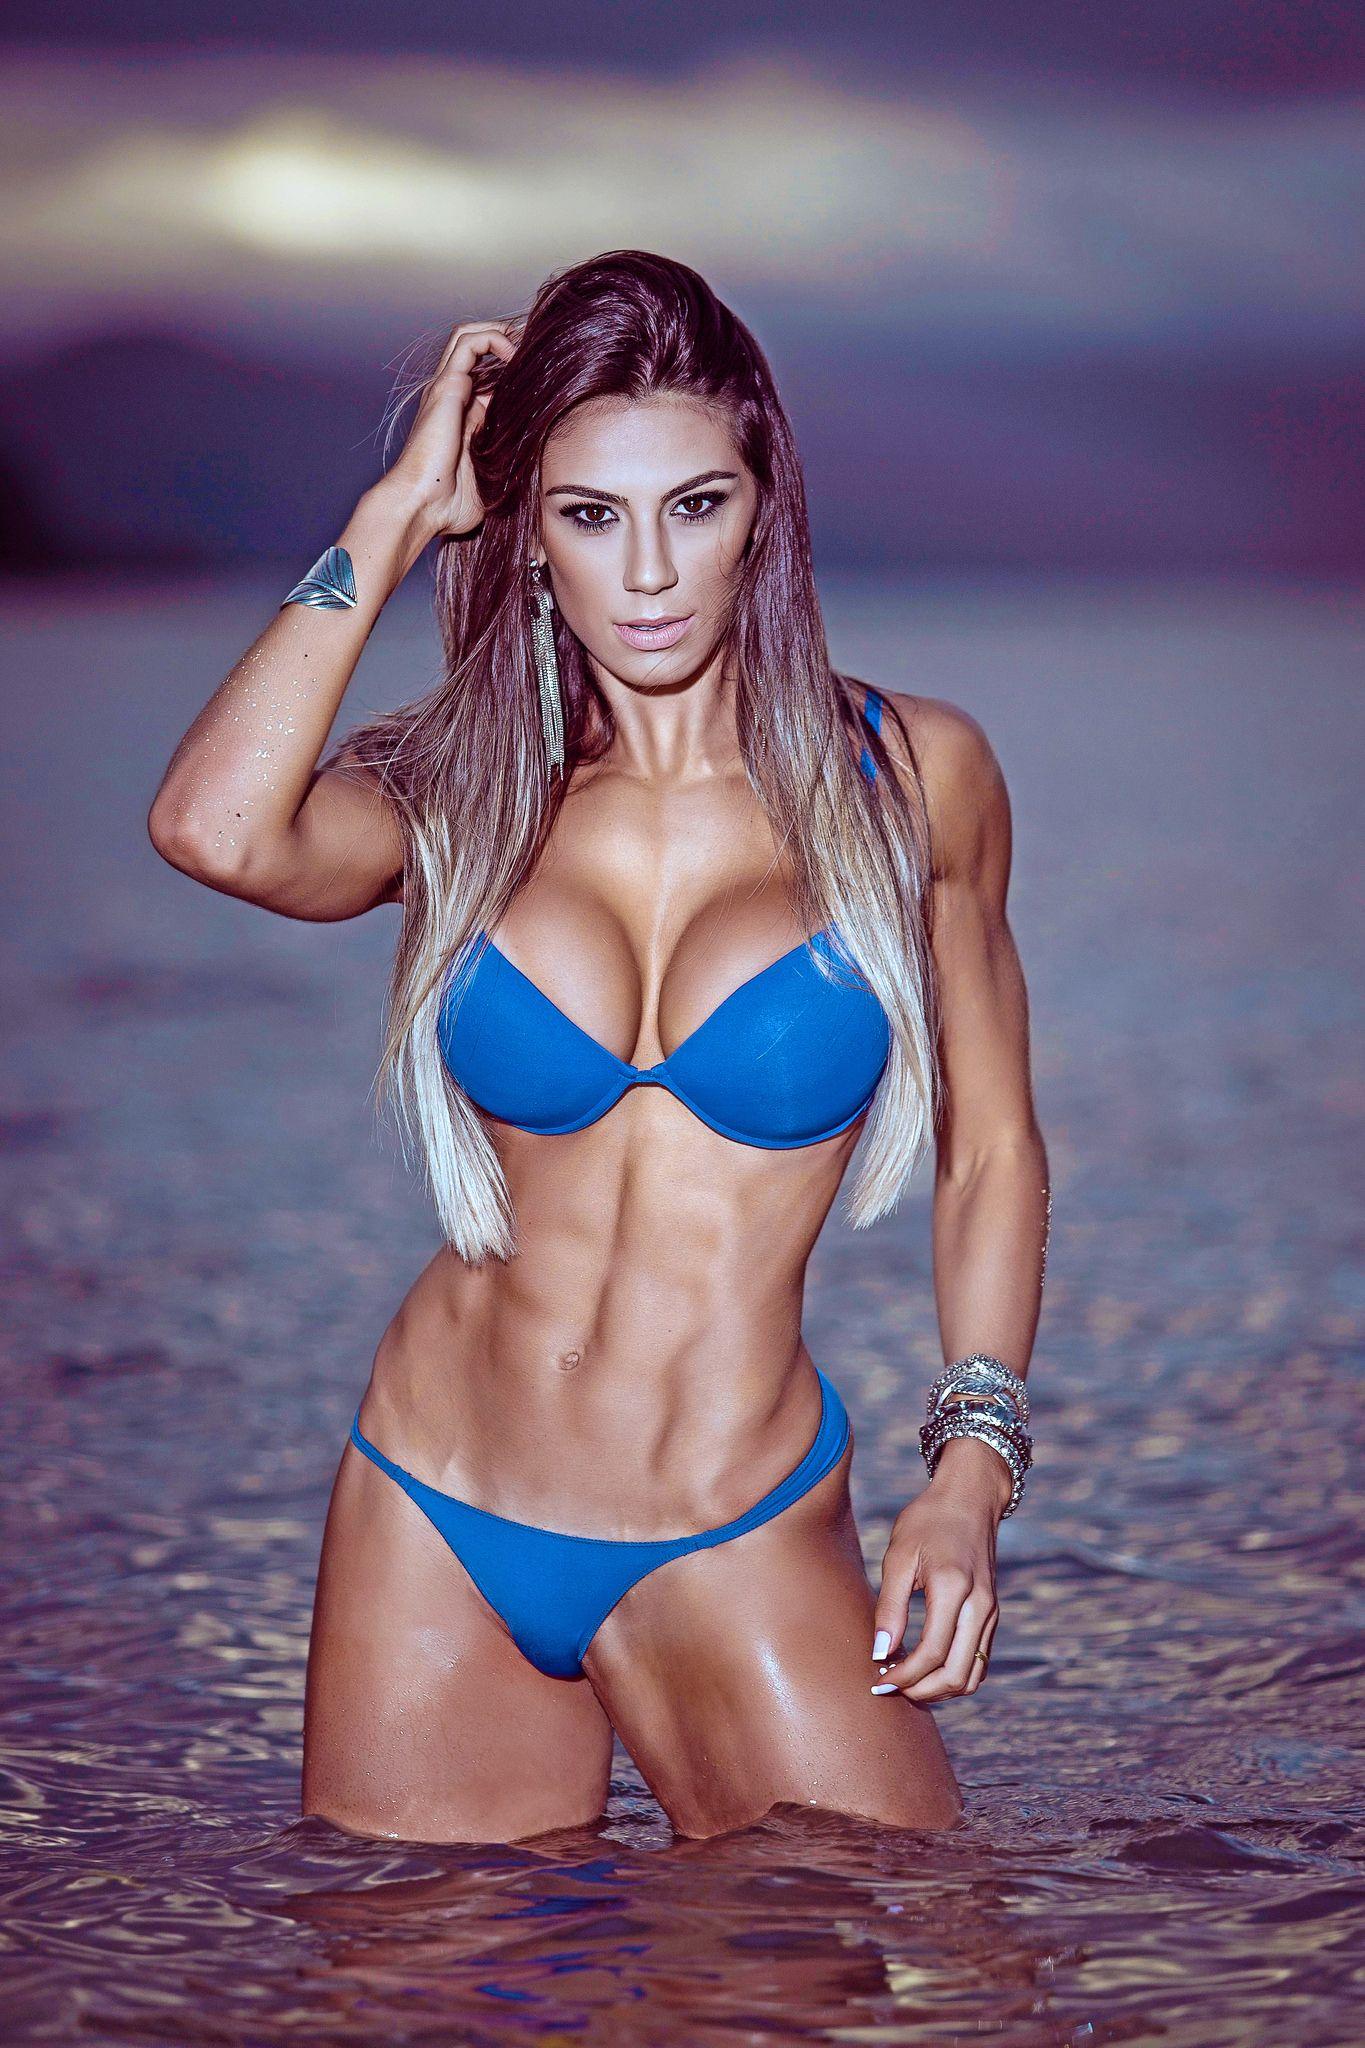 Bikini Carol Paredes nudes (44 photo), Pussy, Paparazzi, Boobs, see through 2015